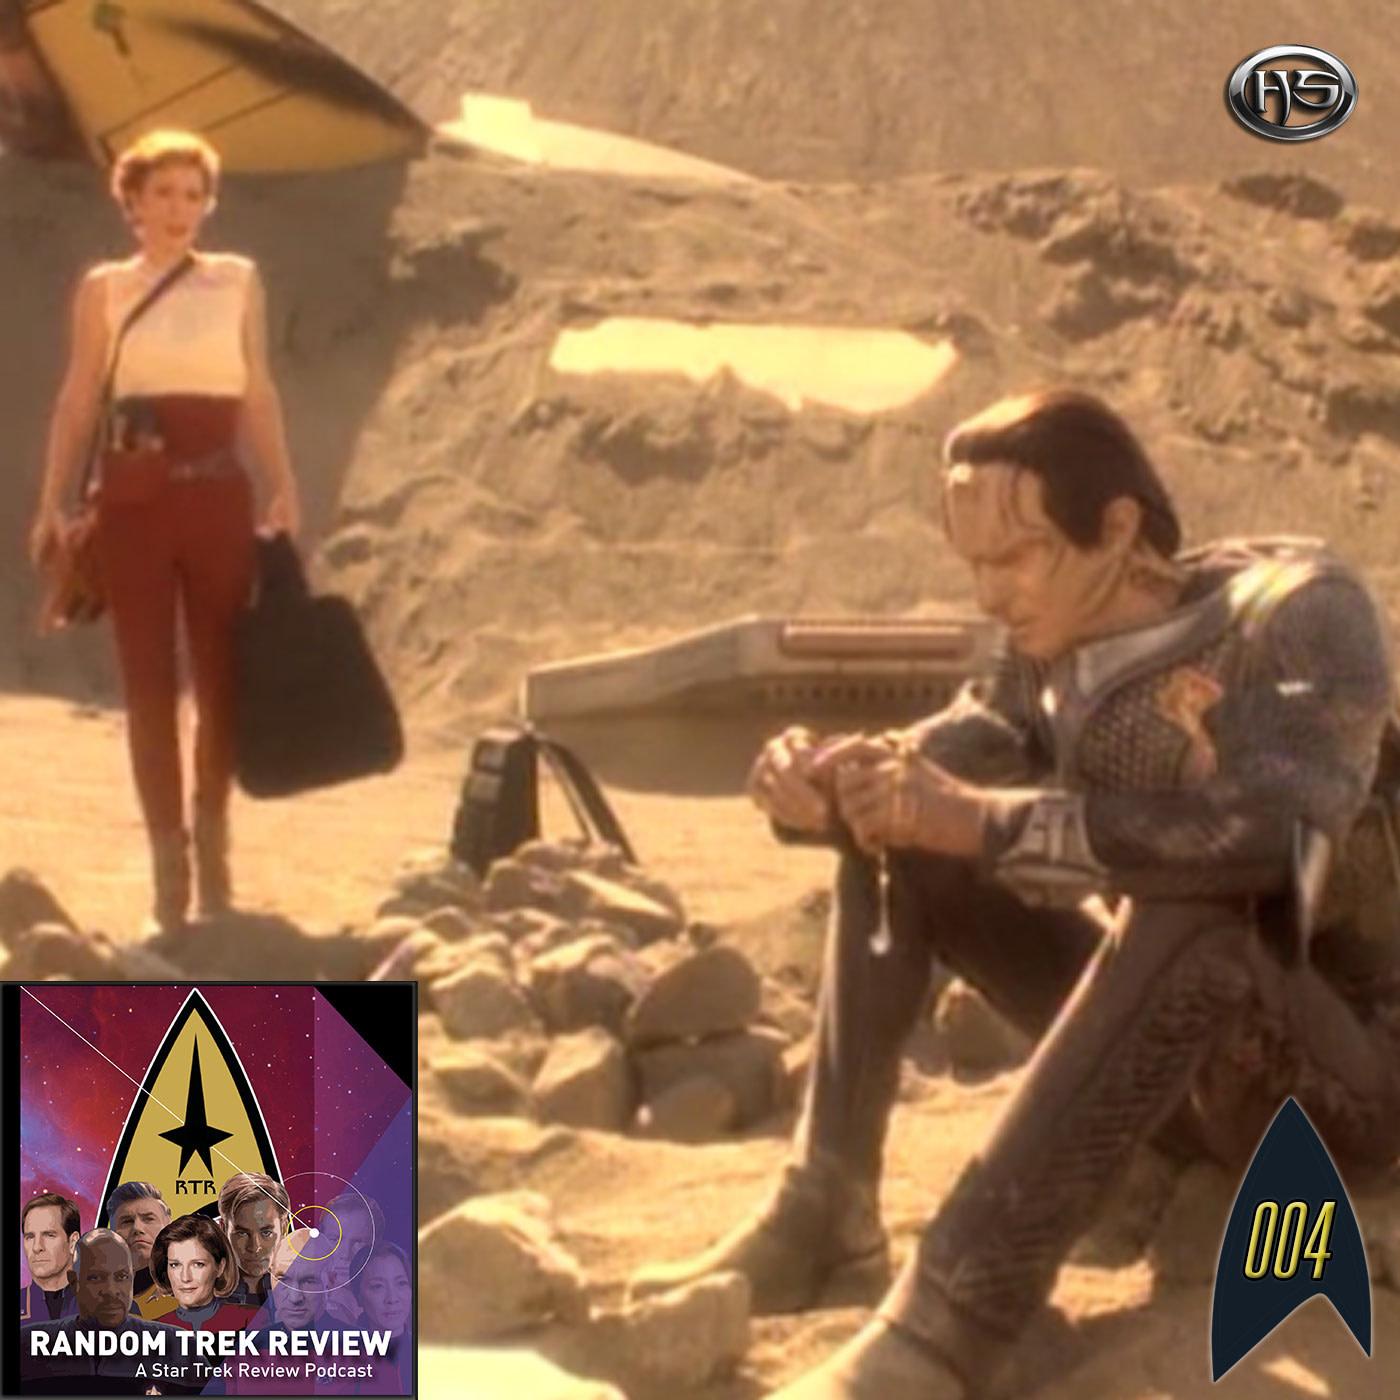 Random Trek Review Episode 4